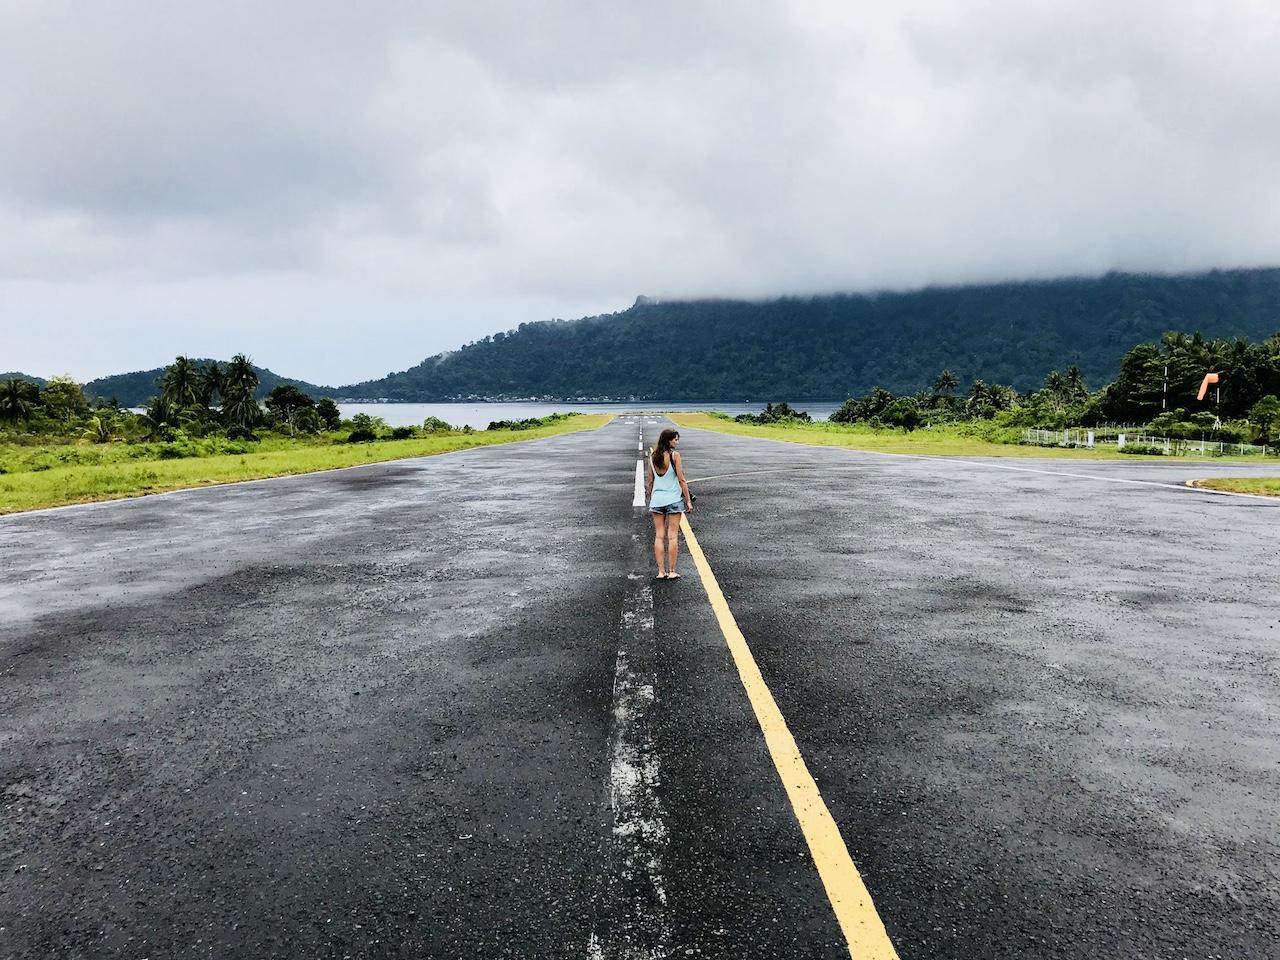 Banda-Inseln-Banda-Neira-Landebahn